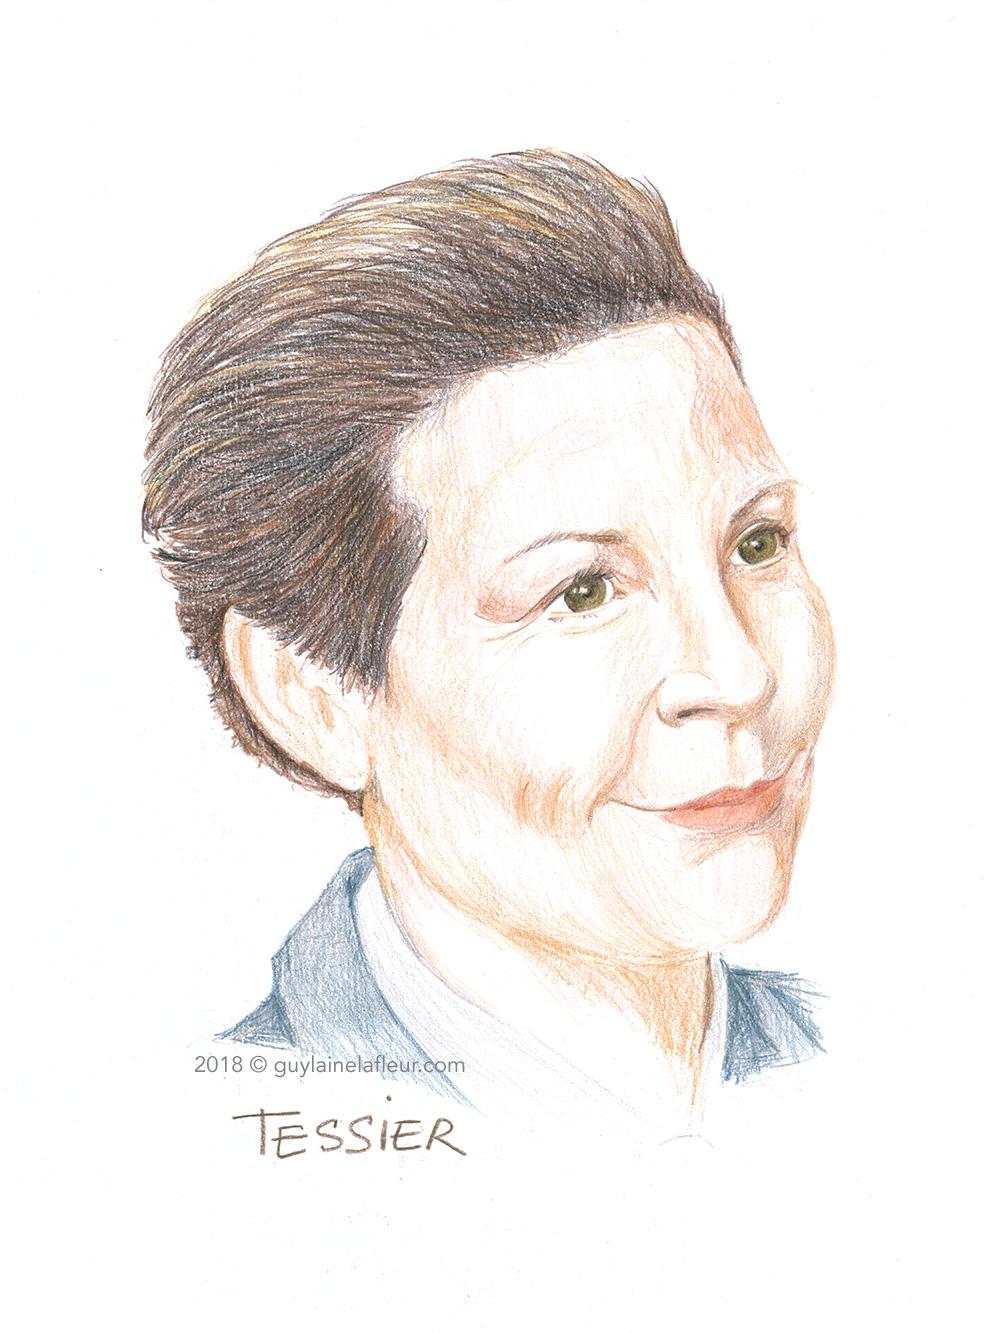 Madeleine Tessier - Marie-Chantal Perron